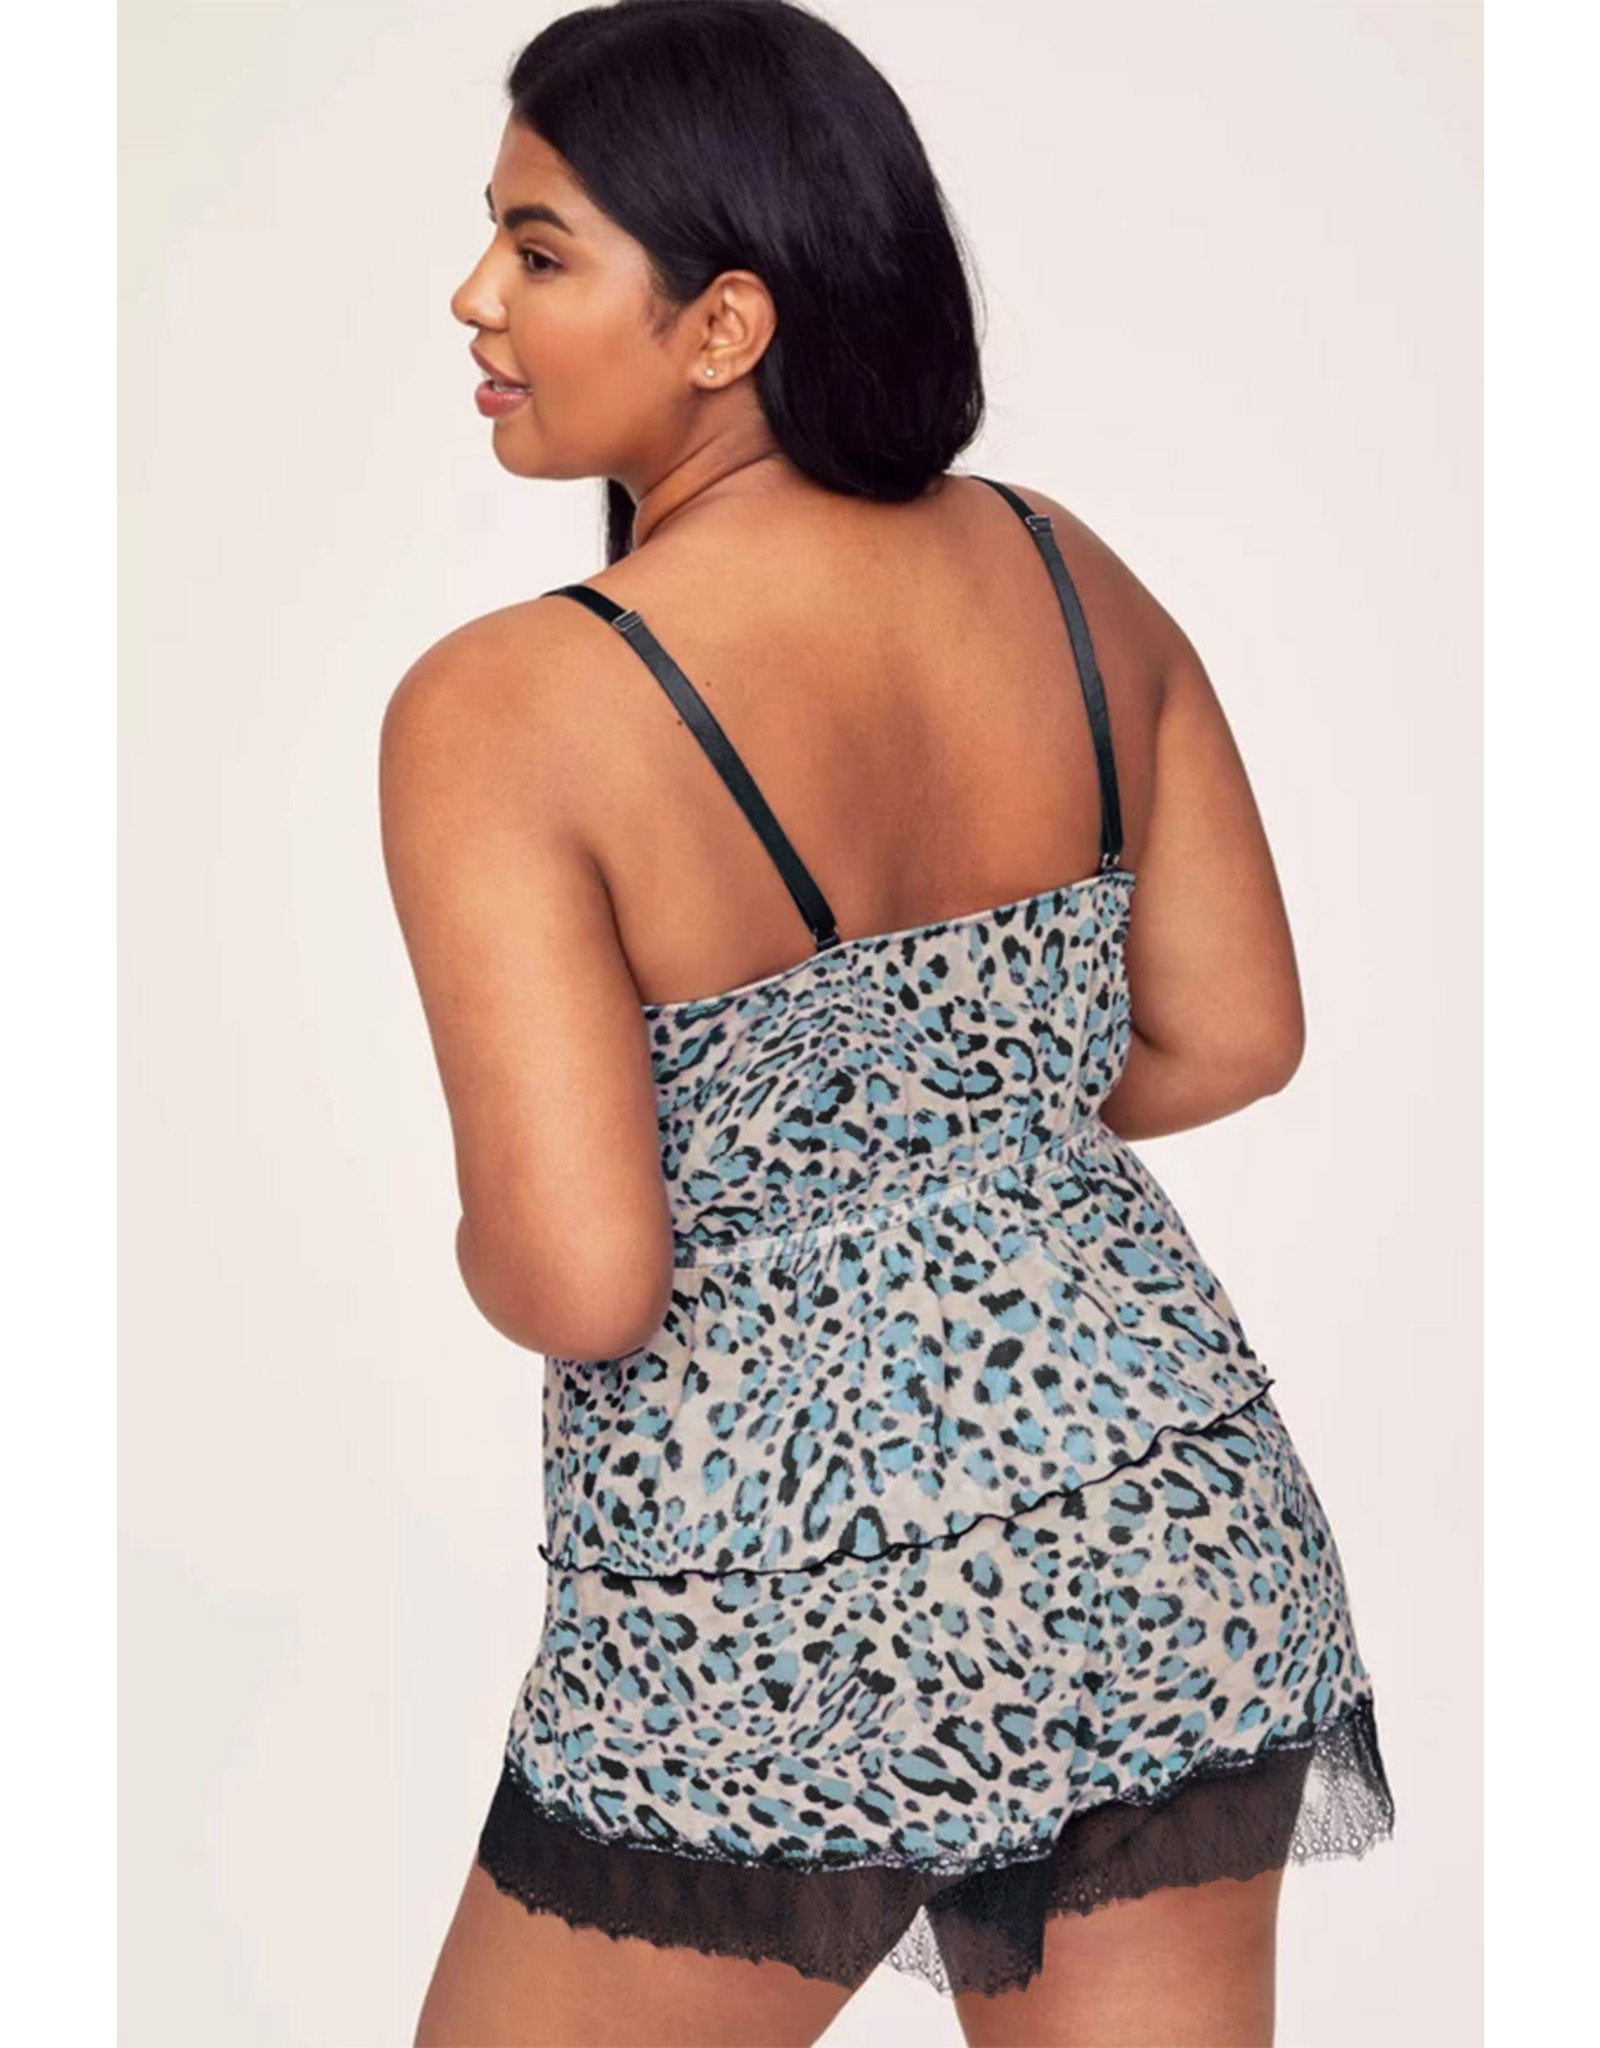 Babylon Leopard Eyelash Lace Cami Top and Shorts Set 3ْX